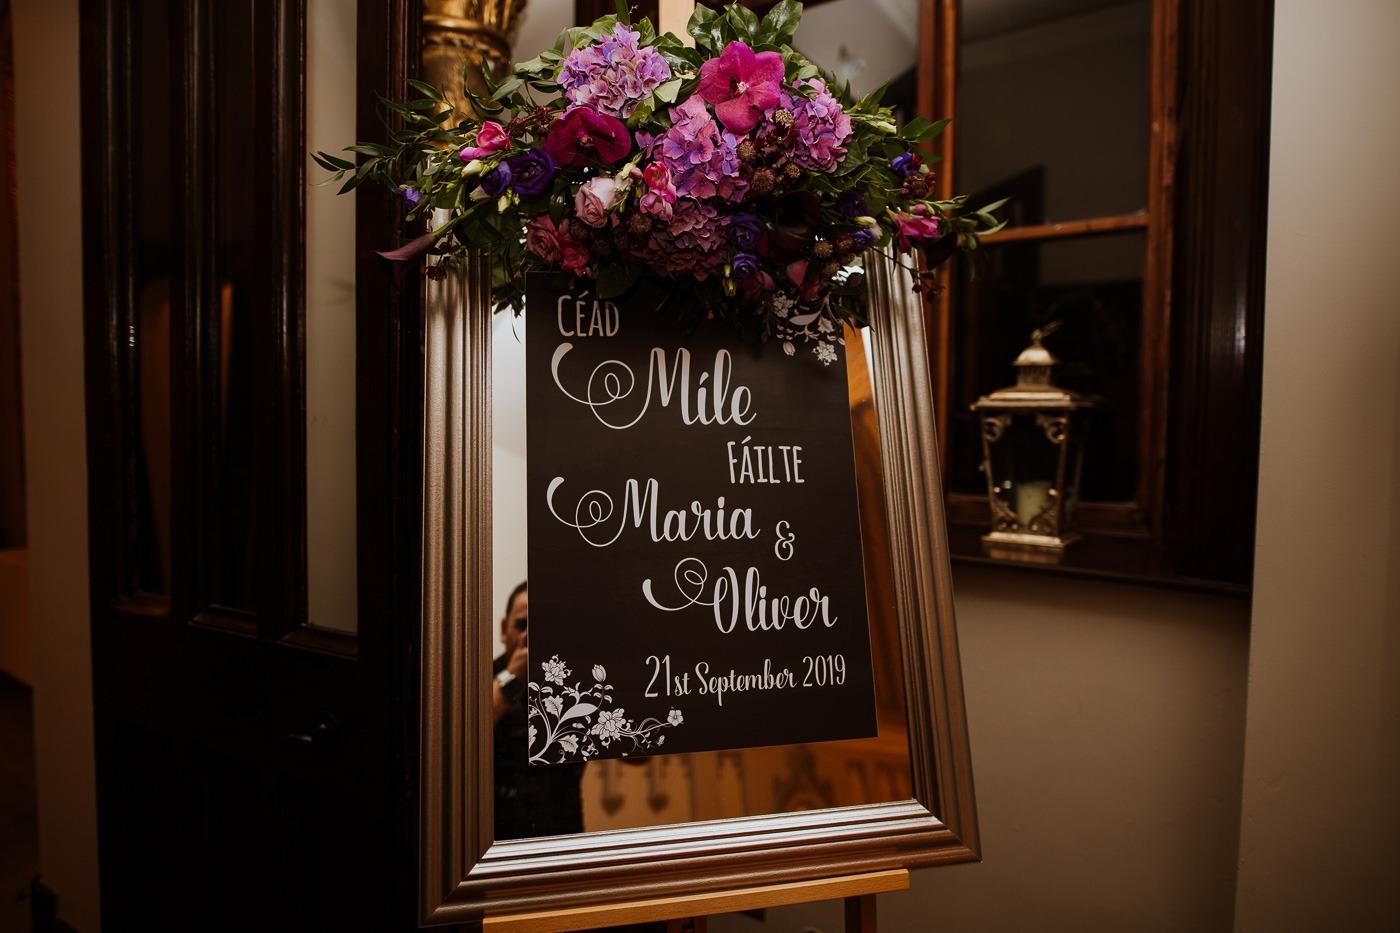 A vase of flowers sitting in a dark room